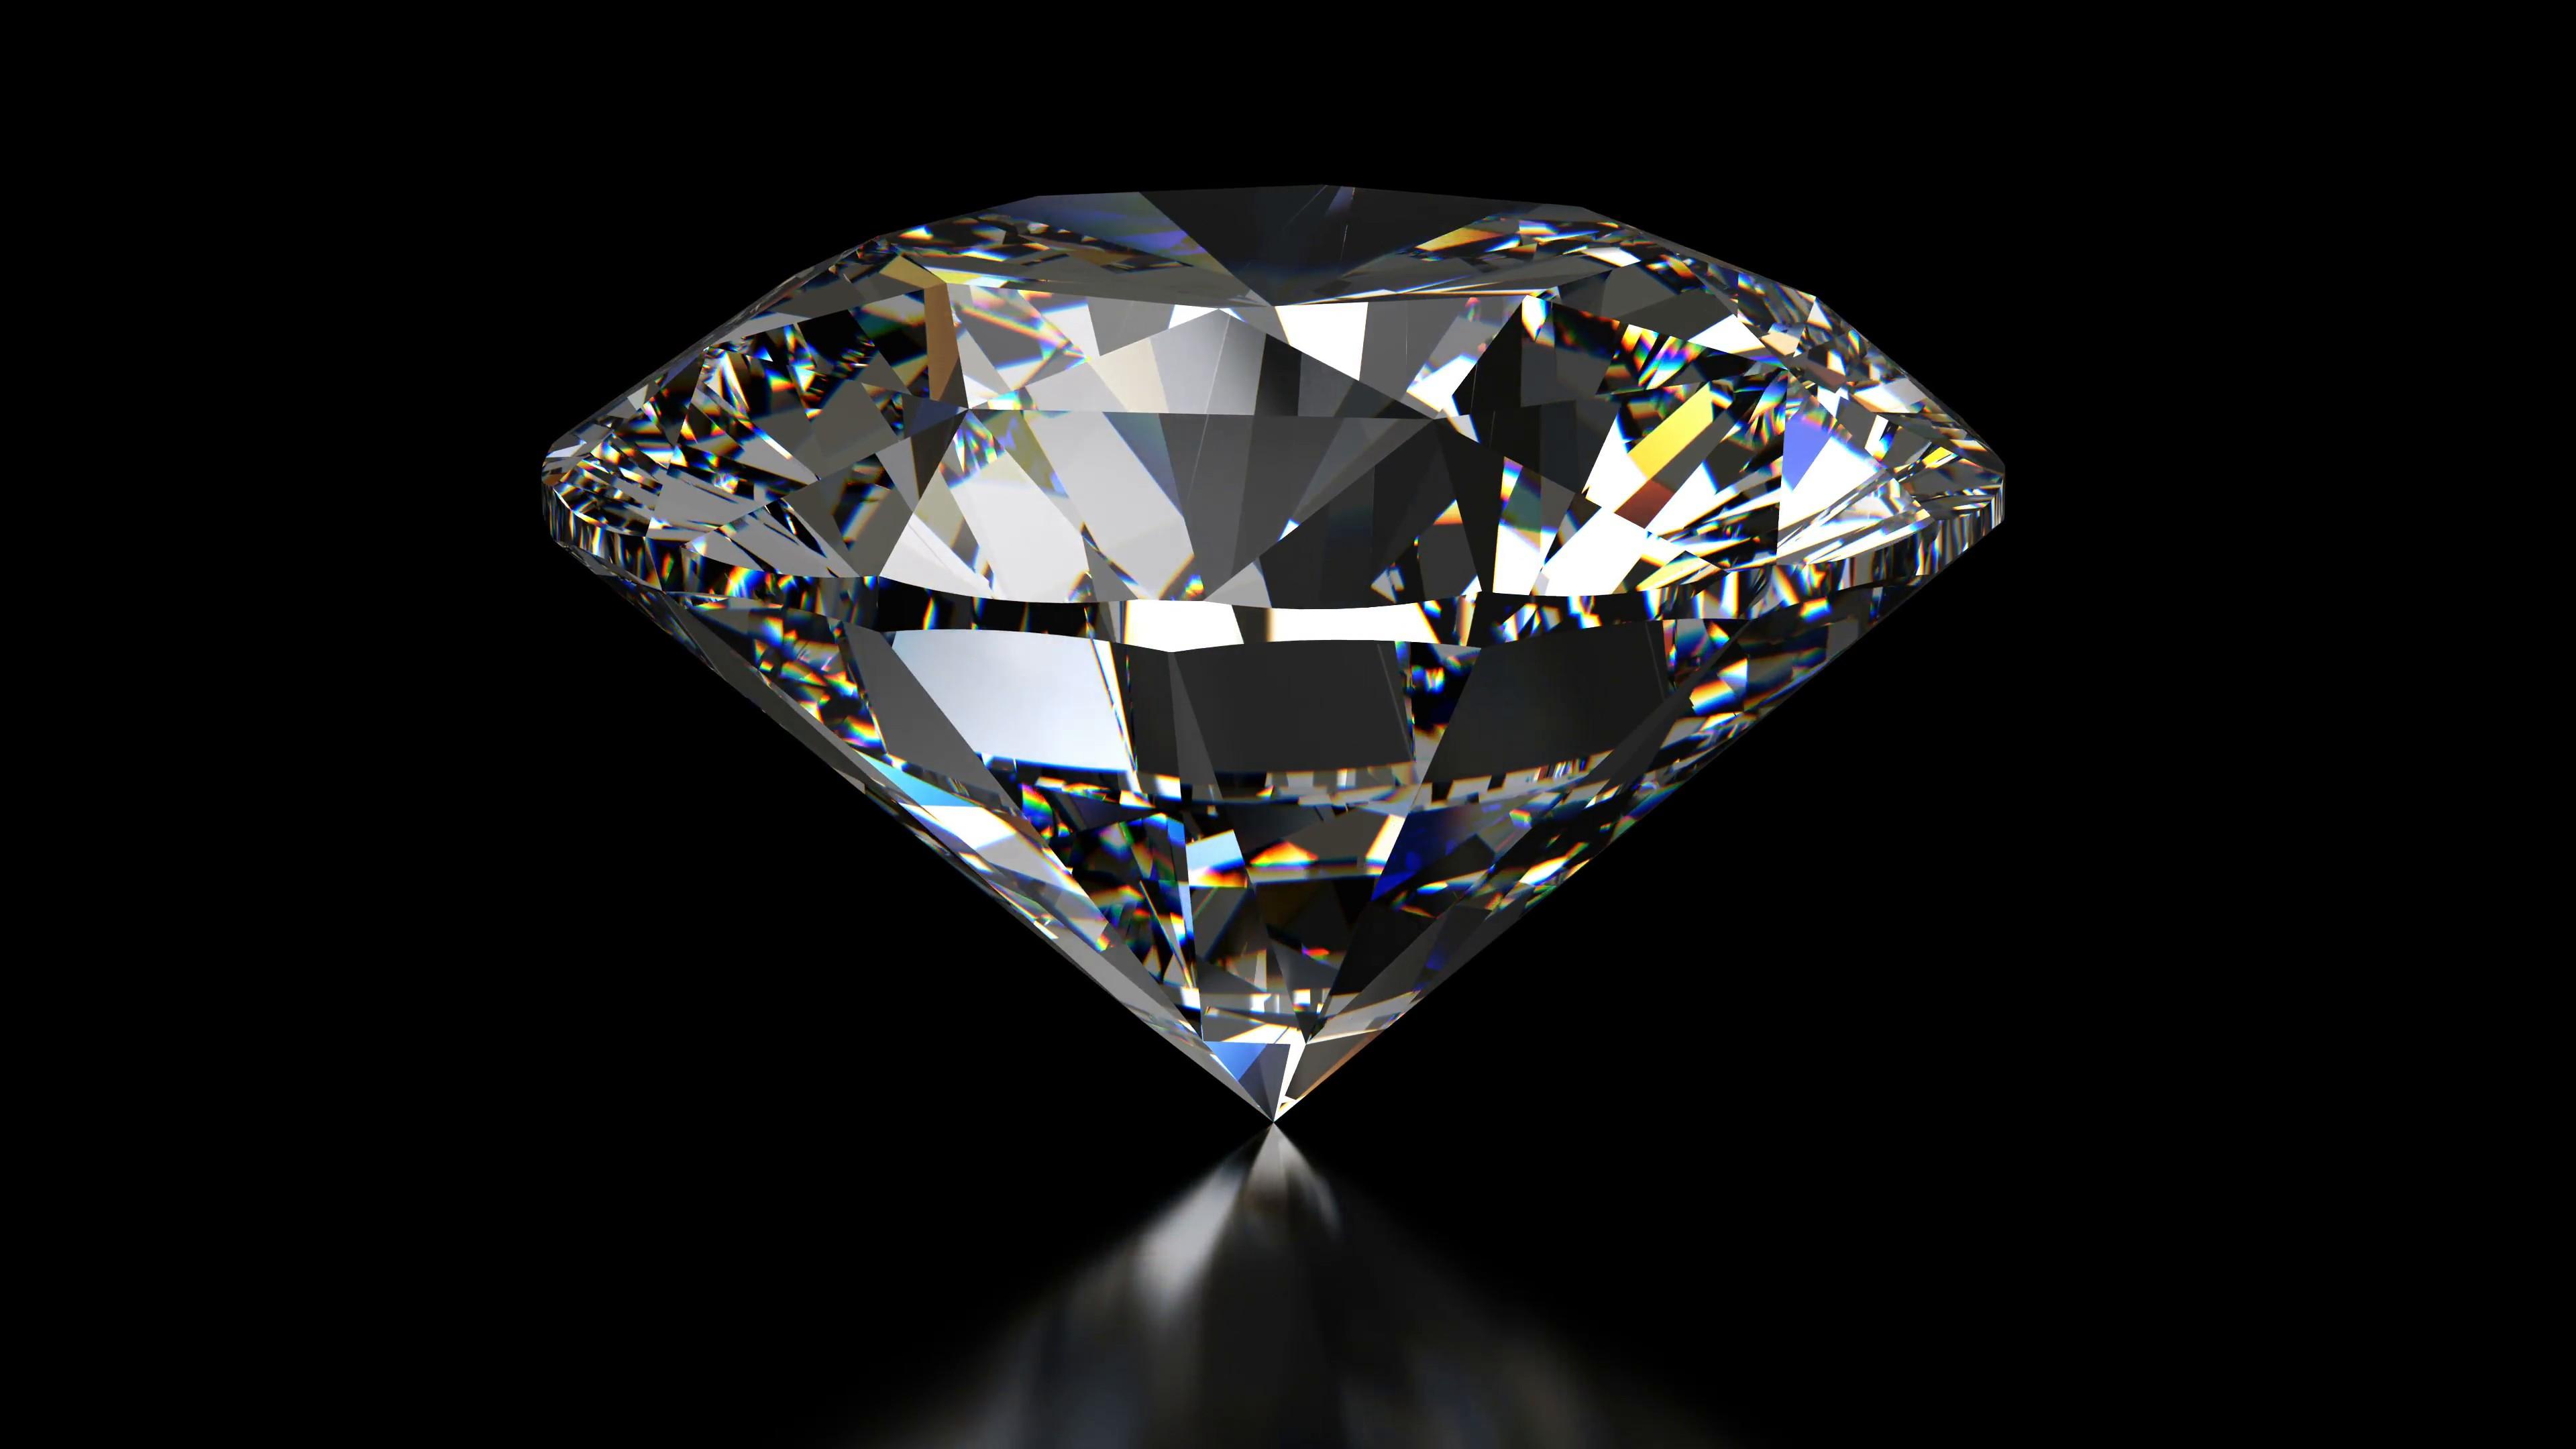 Diamond Background 183 ① Download Free Beautiful Backgrounds